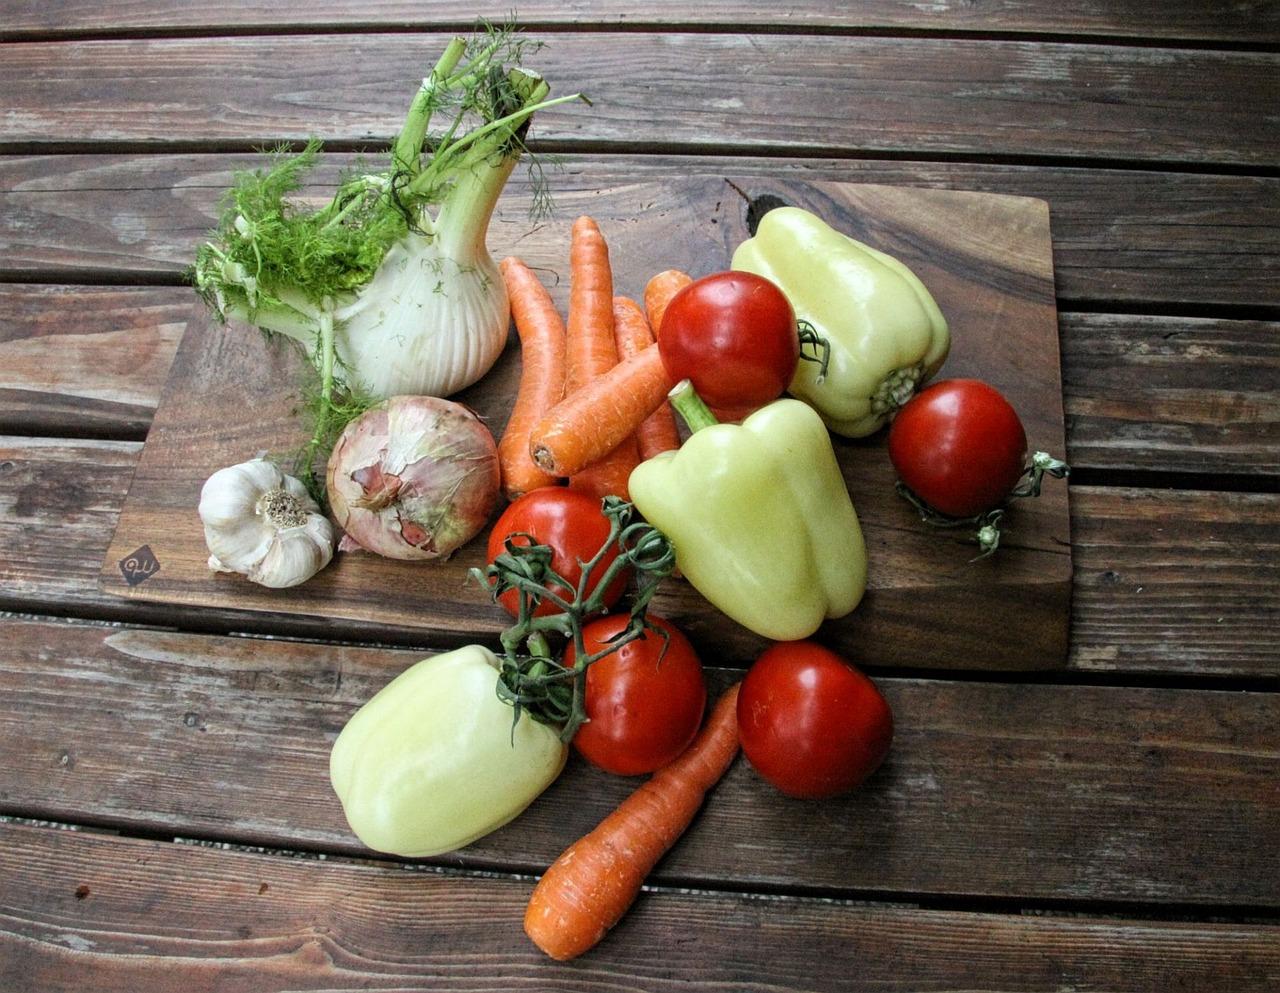 Appliance City - Vegan Recipes - National Vegan Month